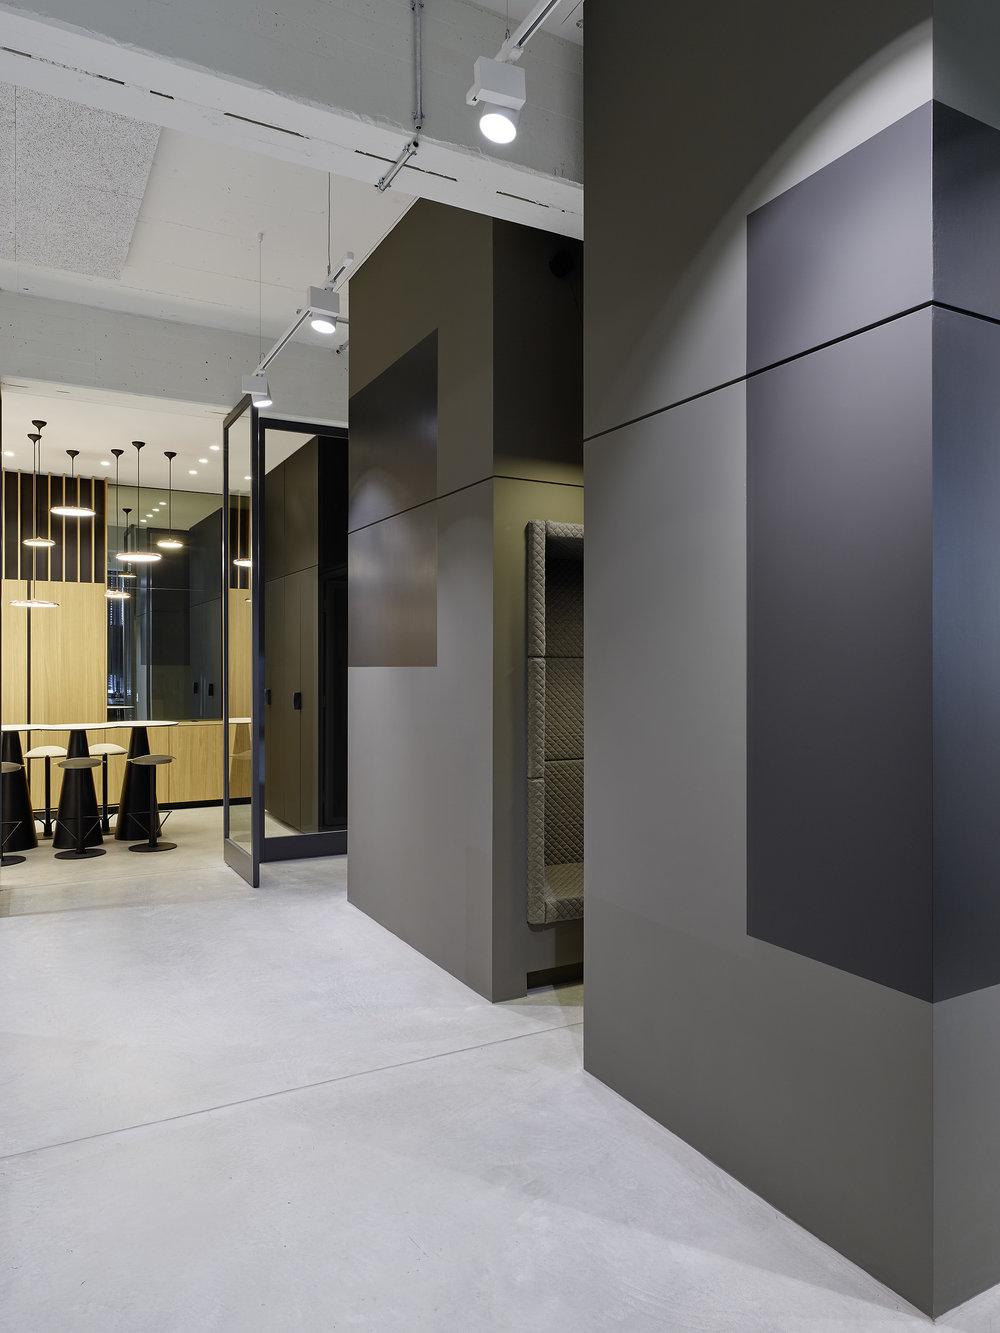 Innenarchitektur Stuttgart - Büro, Office, Movet Office Loft, Arbeitswelt, Nachhaltigkeit